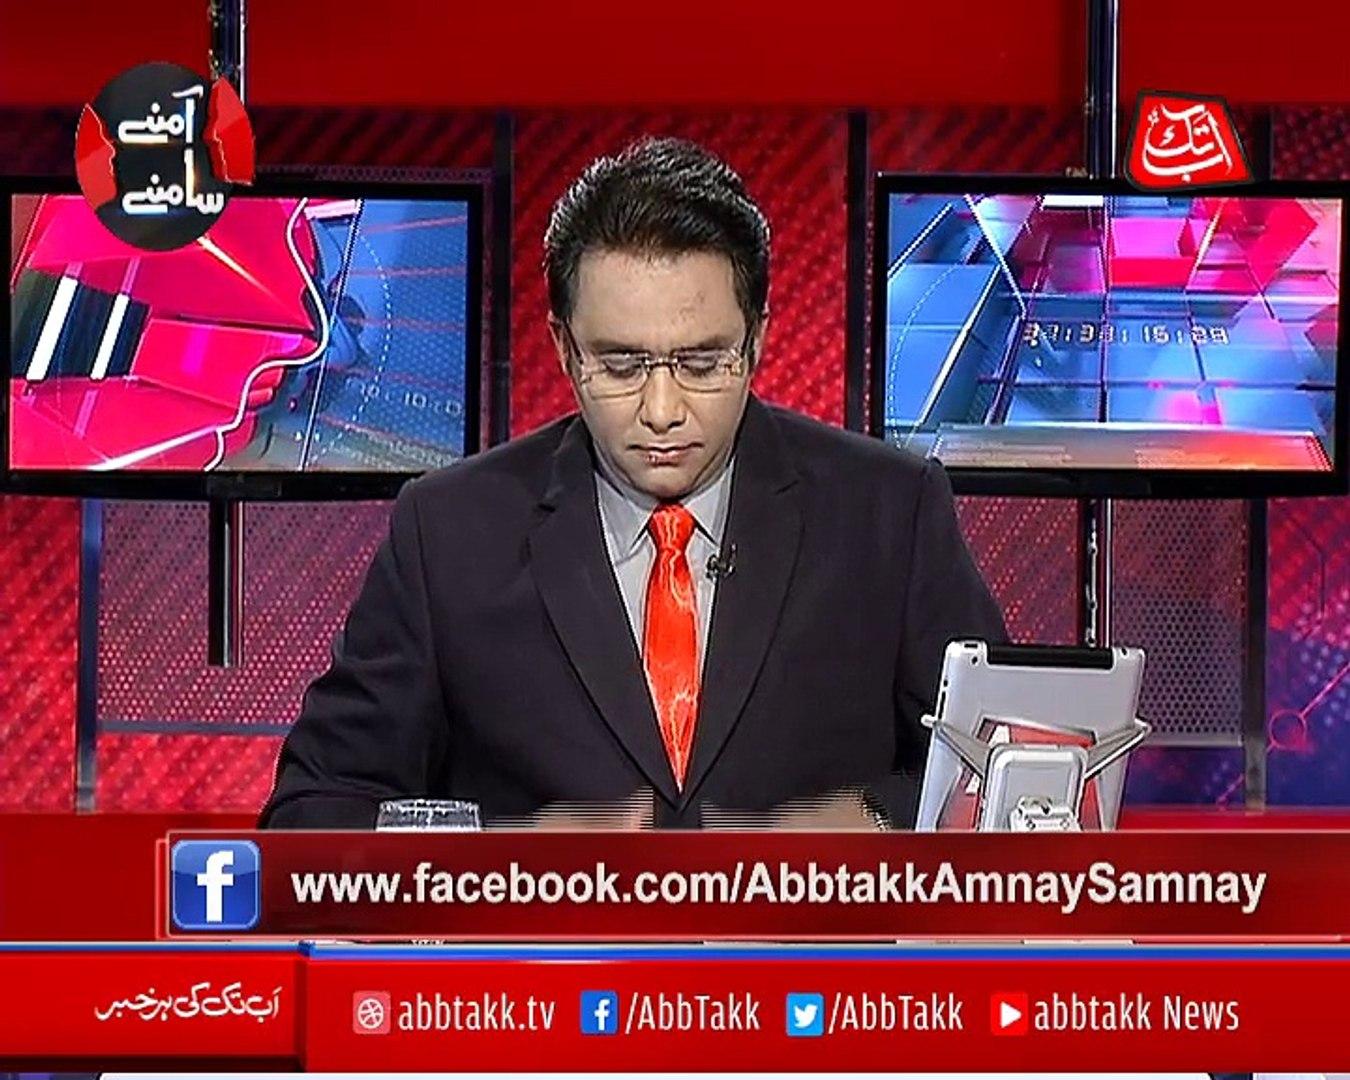 Abb Takk - Amnay Samnay With Noor-Ul-Arfeen - Ep 229 - 30 Sep 2018